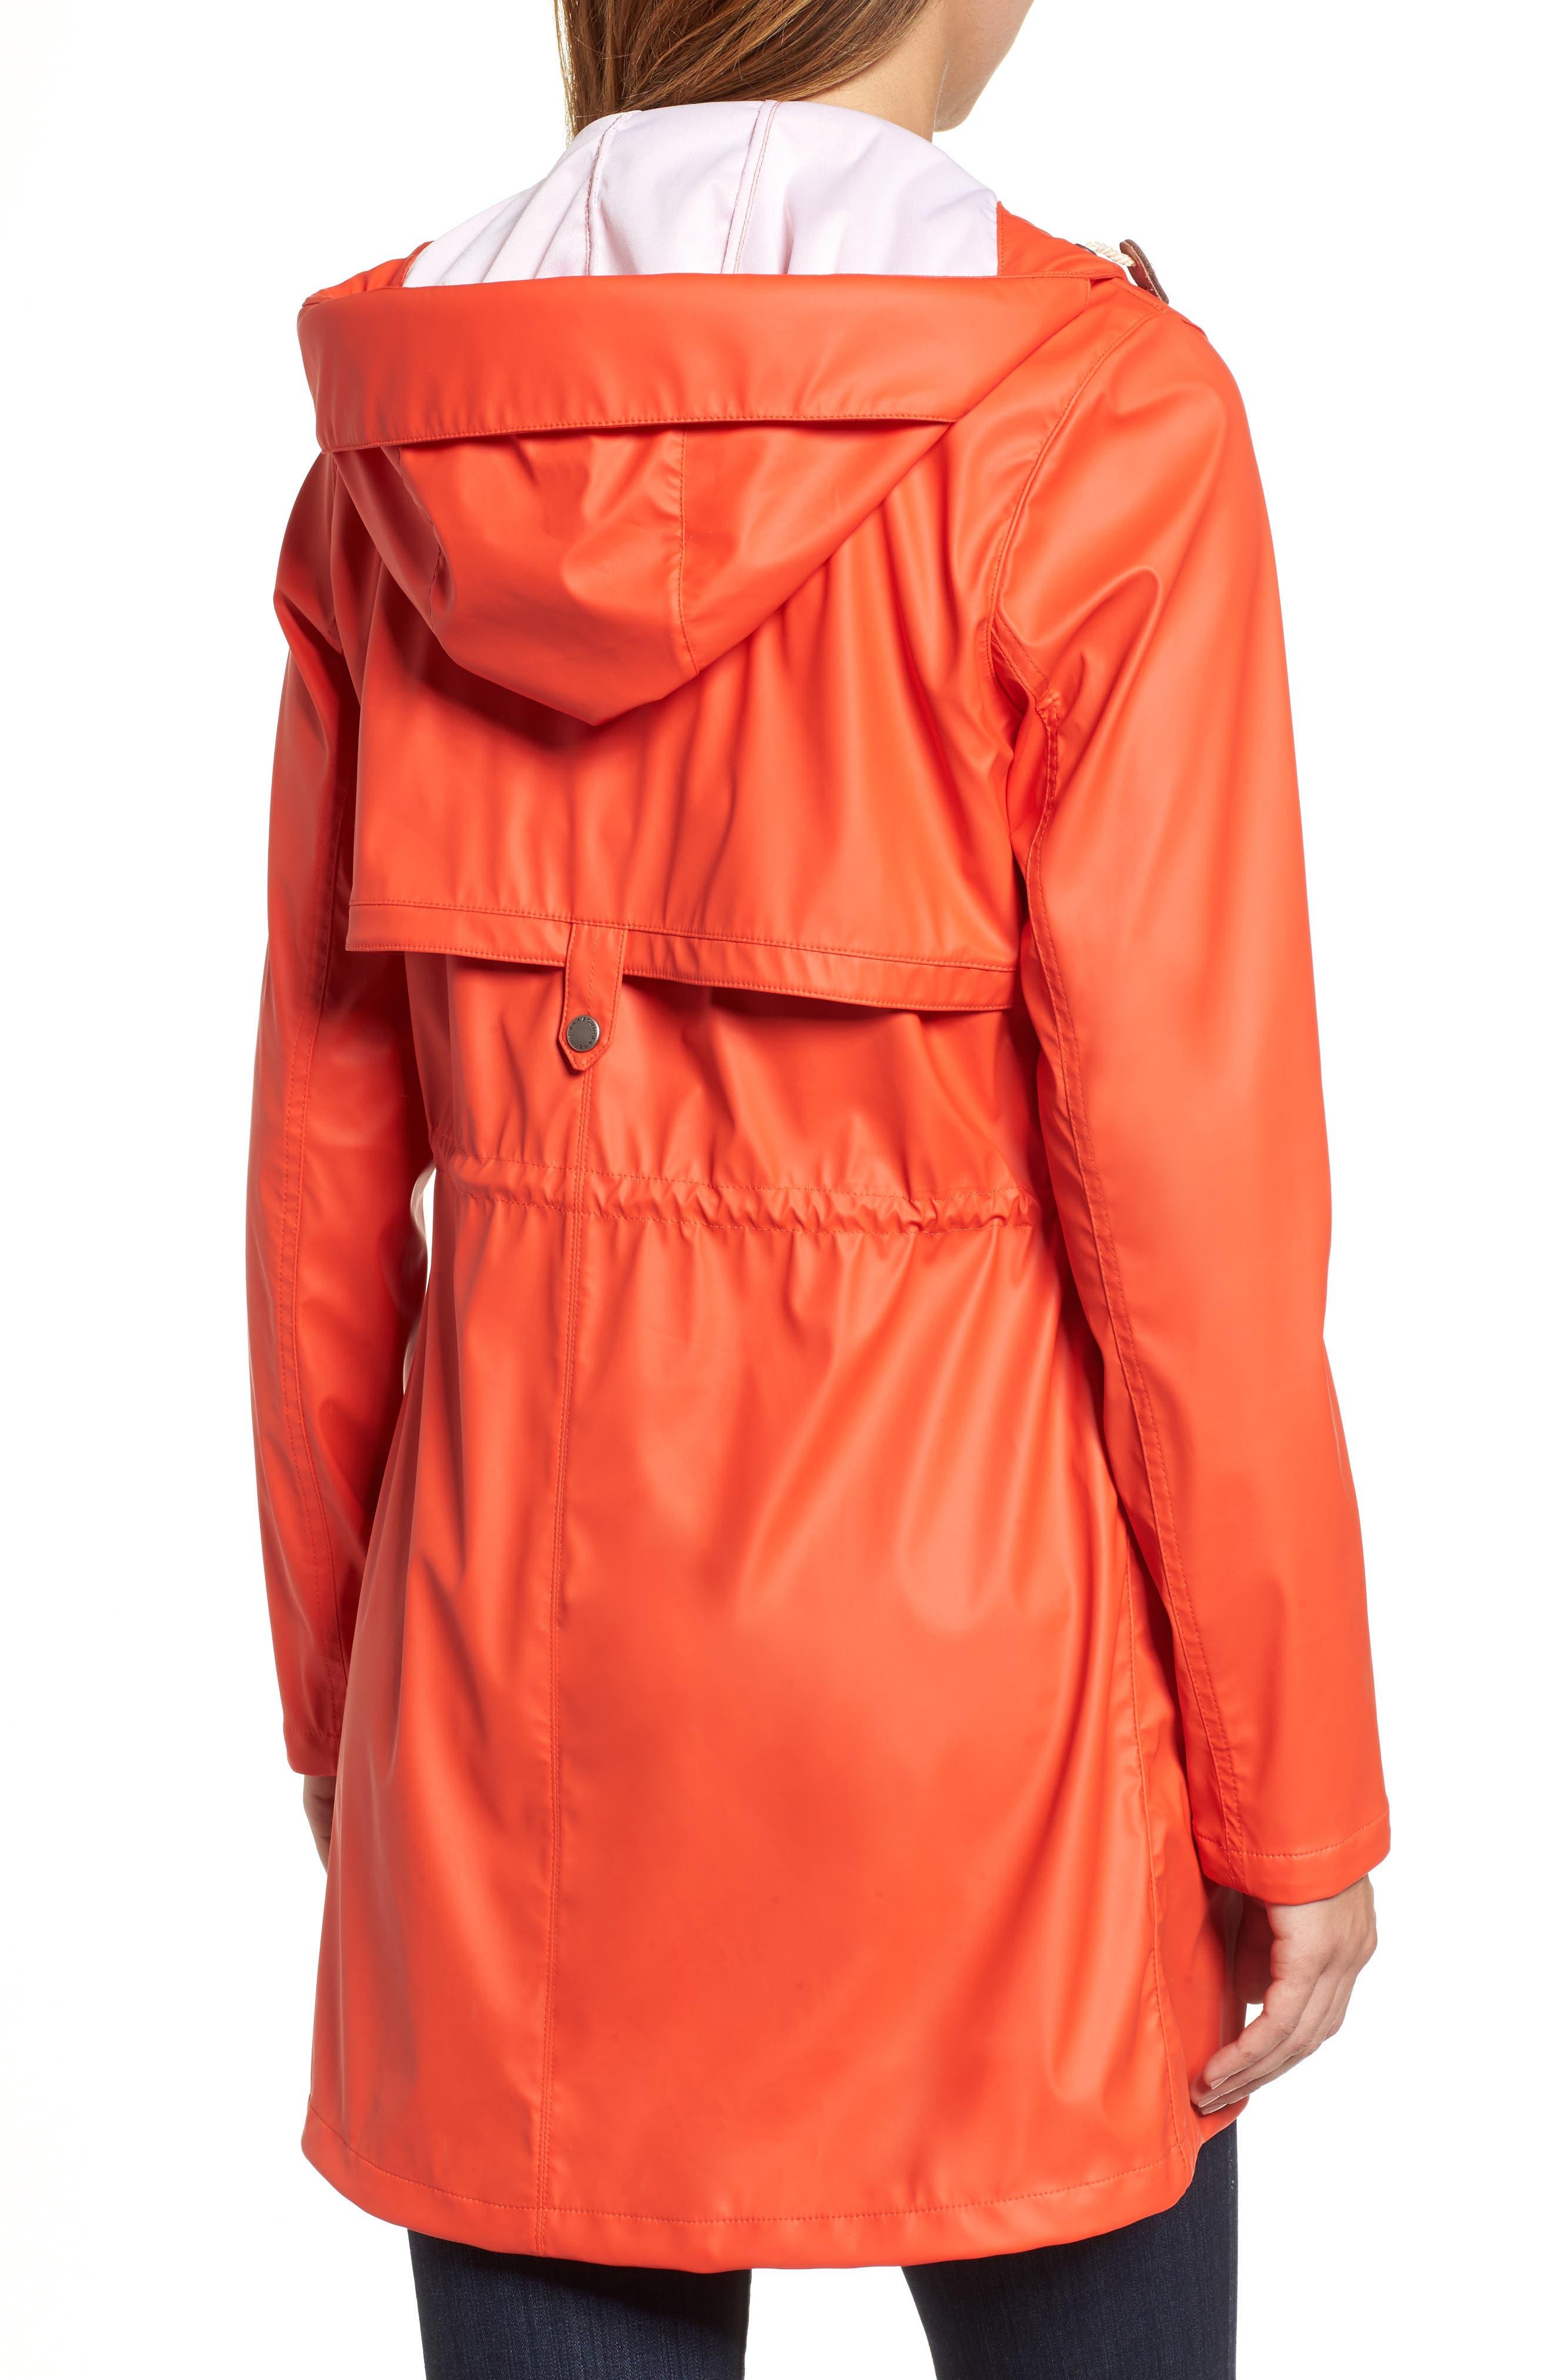 Harbour Hooded Jacket,                             Alternate thumbnail 2, color,                             Signal Orange